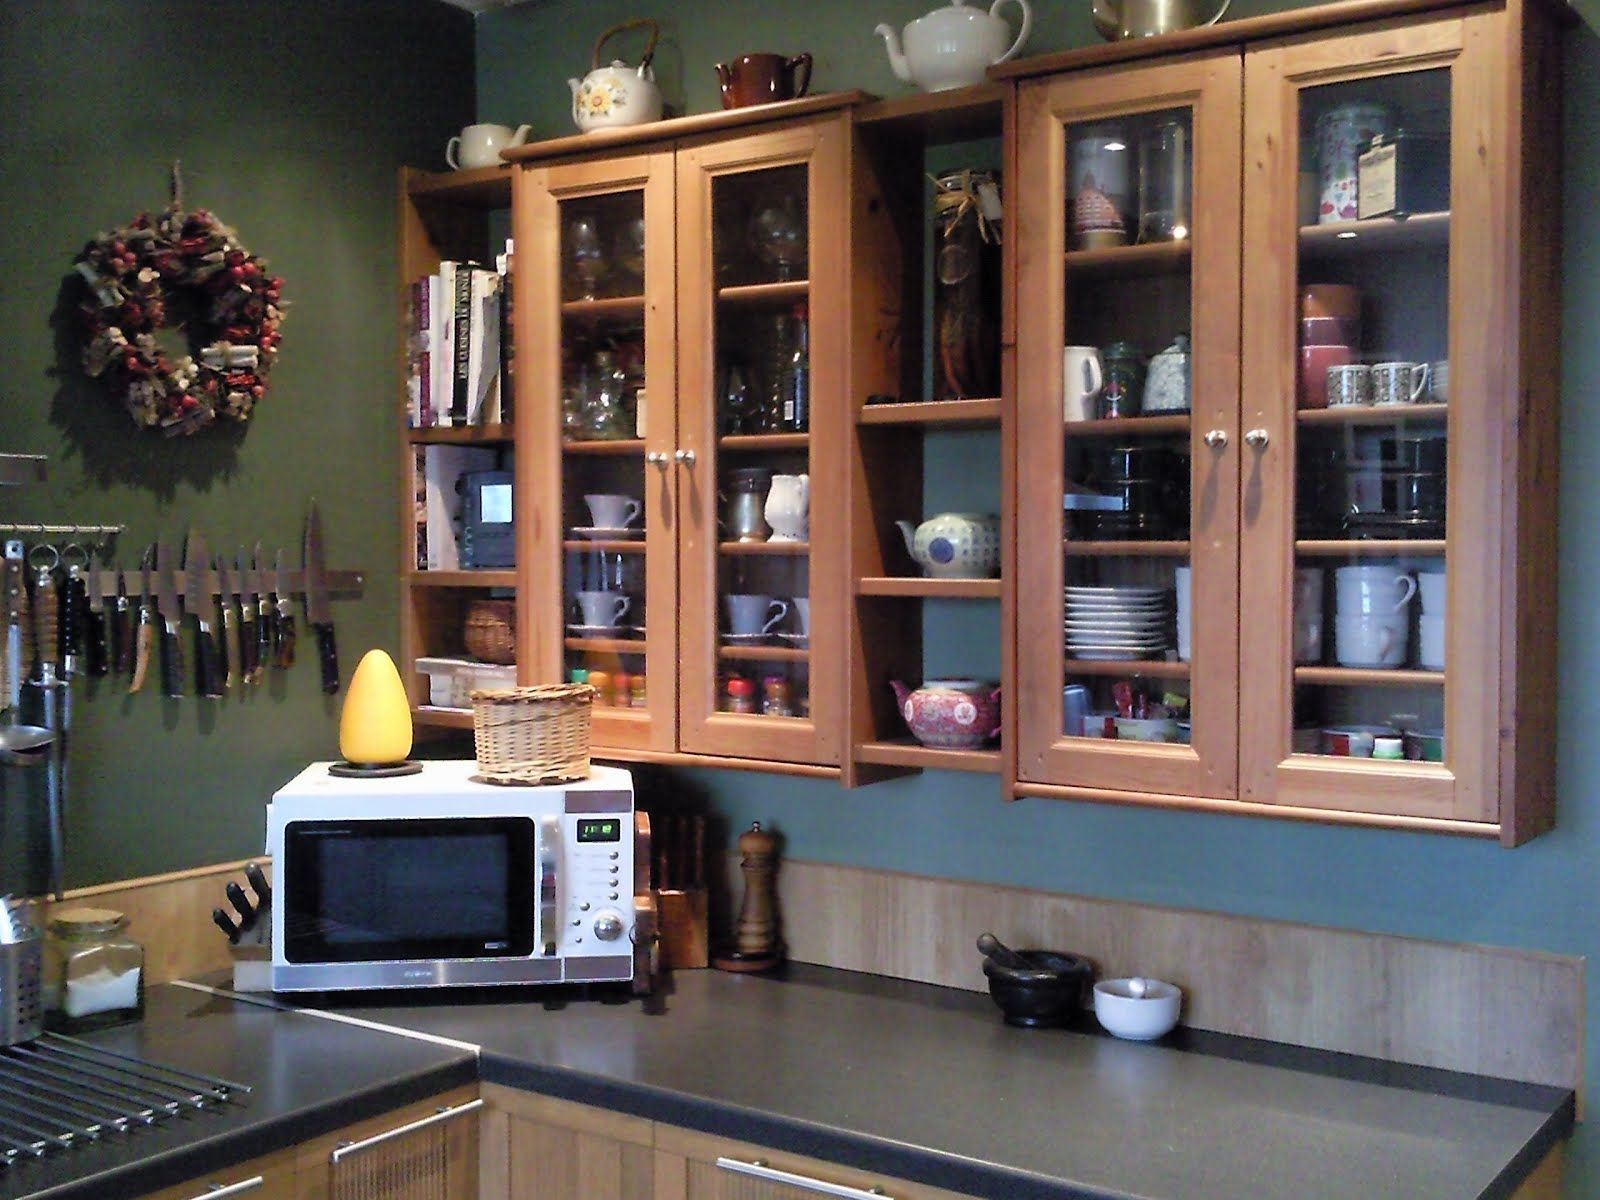 Leksvik Pine CD Cabinets and Ikea Pine Shelves = Kitchen Cabinets ...